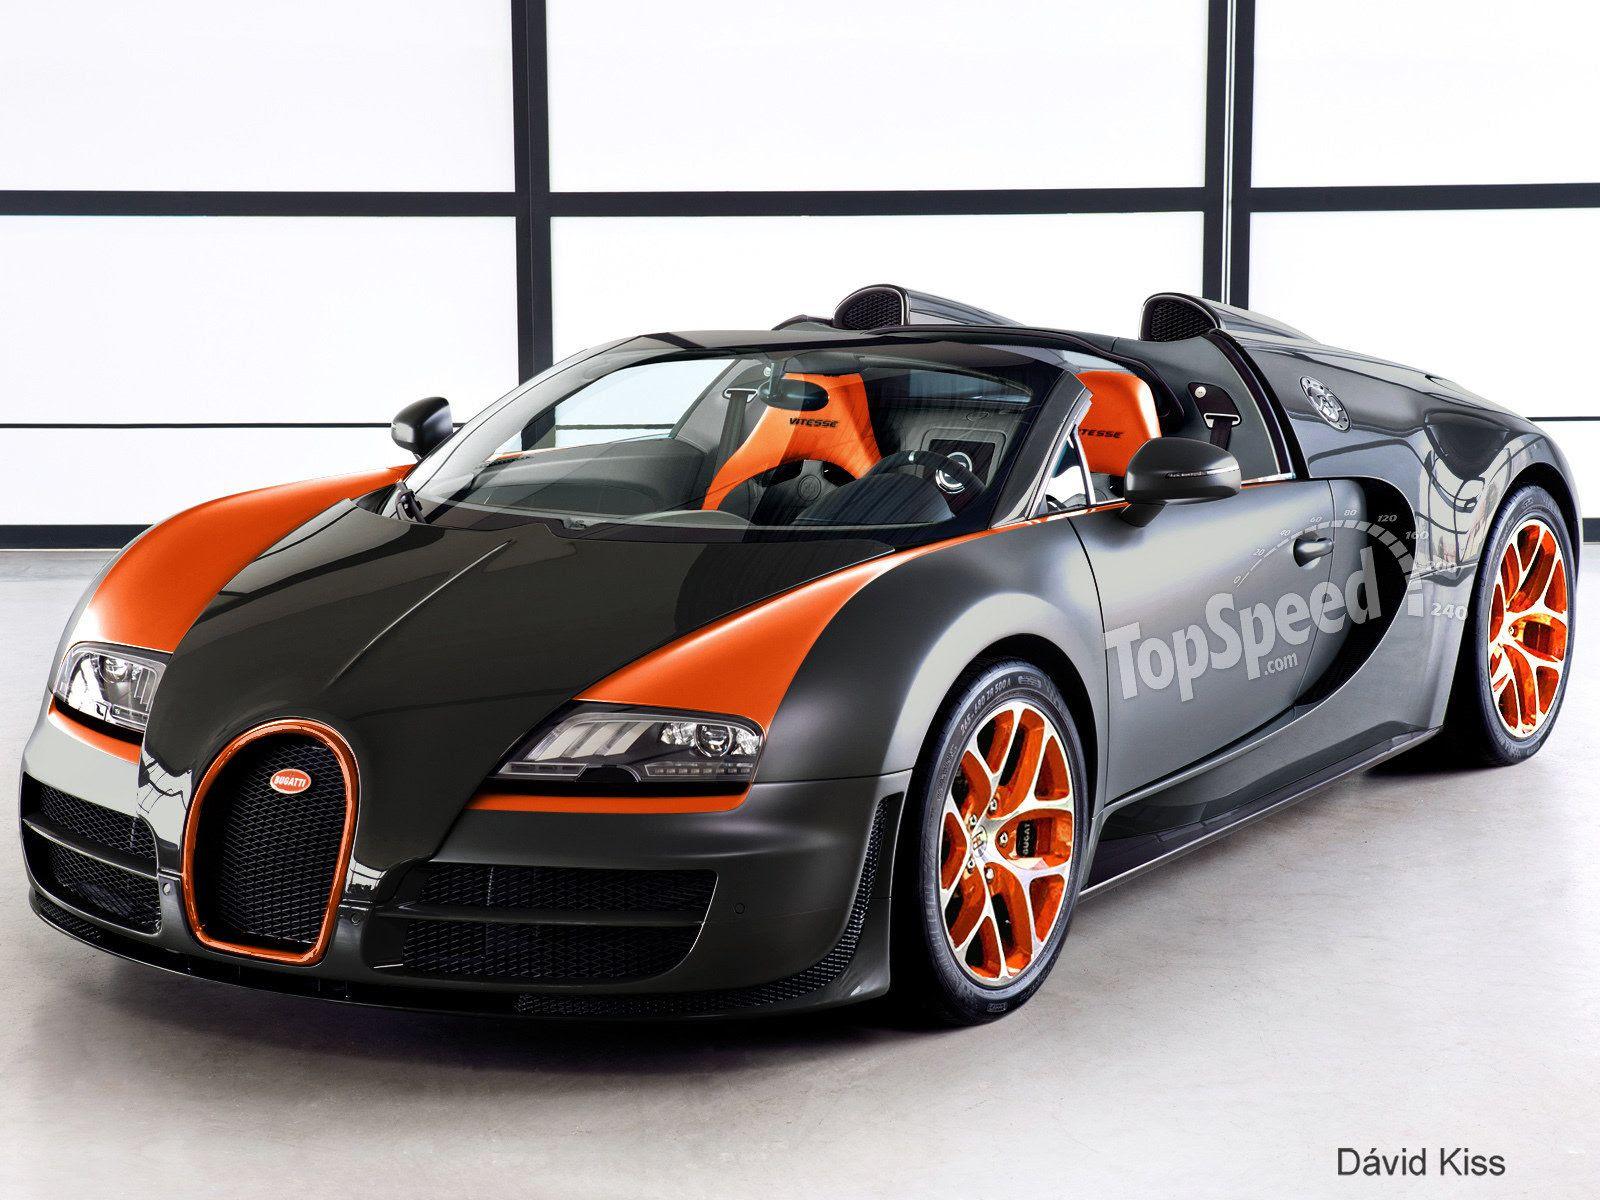 2013 Bugatti Veyron Vitesse WRC Limited Edition - Picture ...